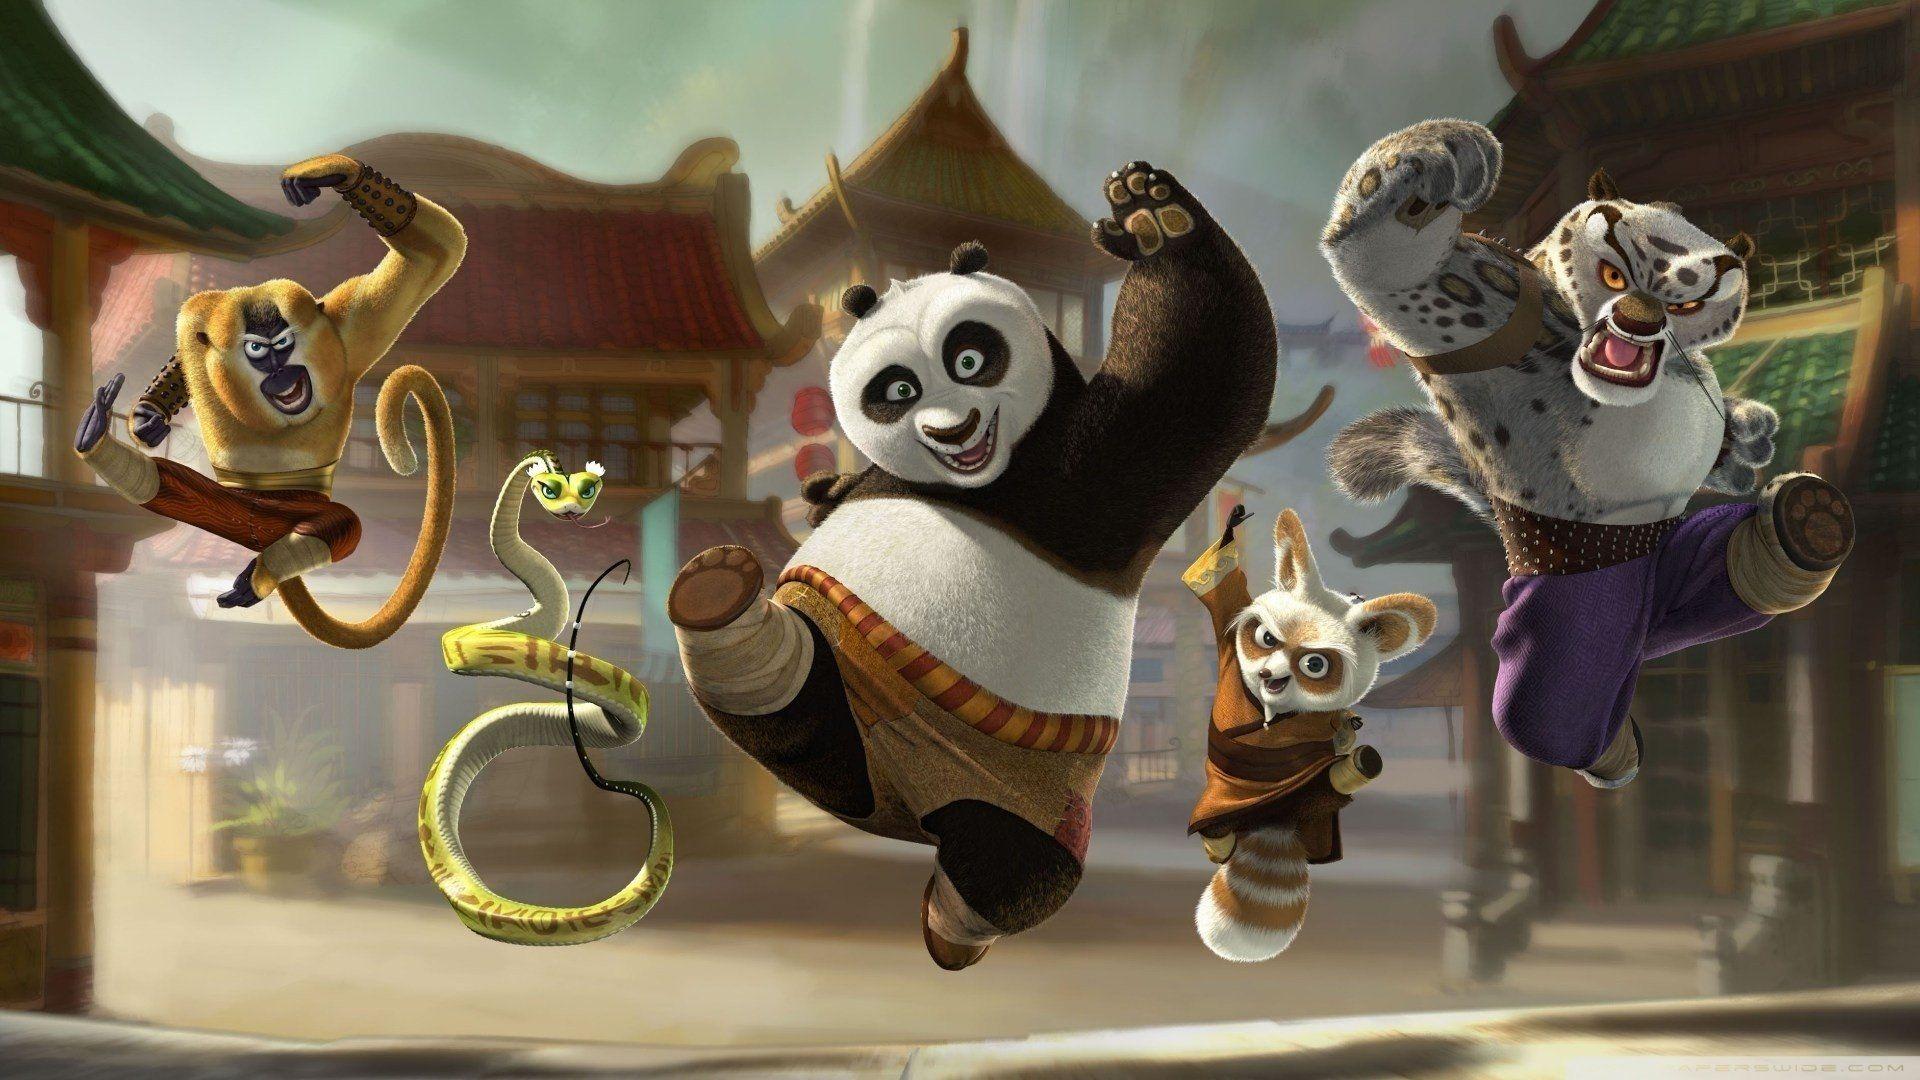 Kung fu panda dreamworks animation art wallpapers pinterest